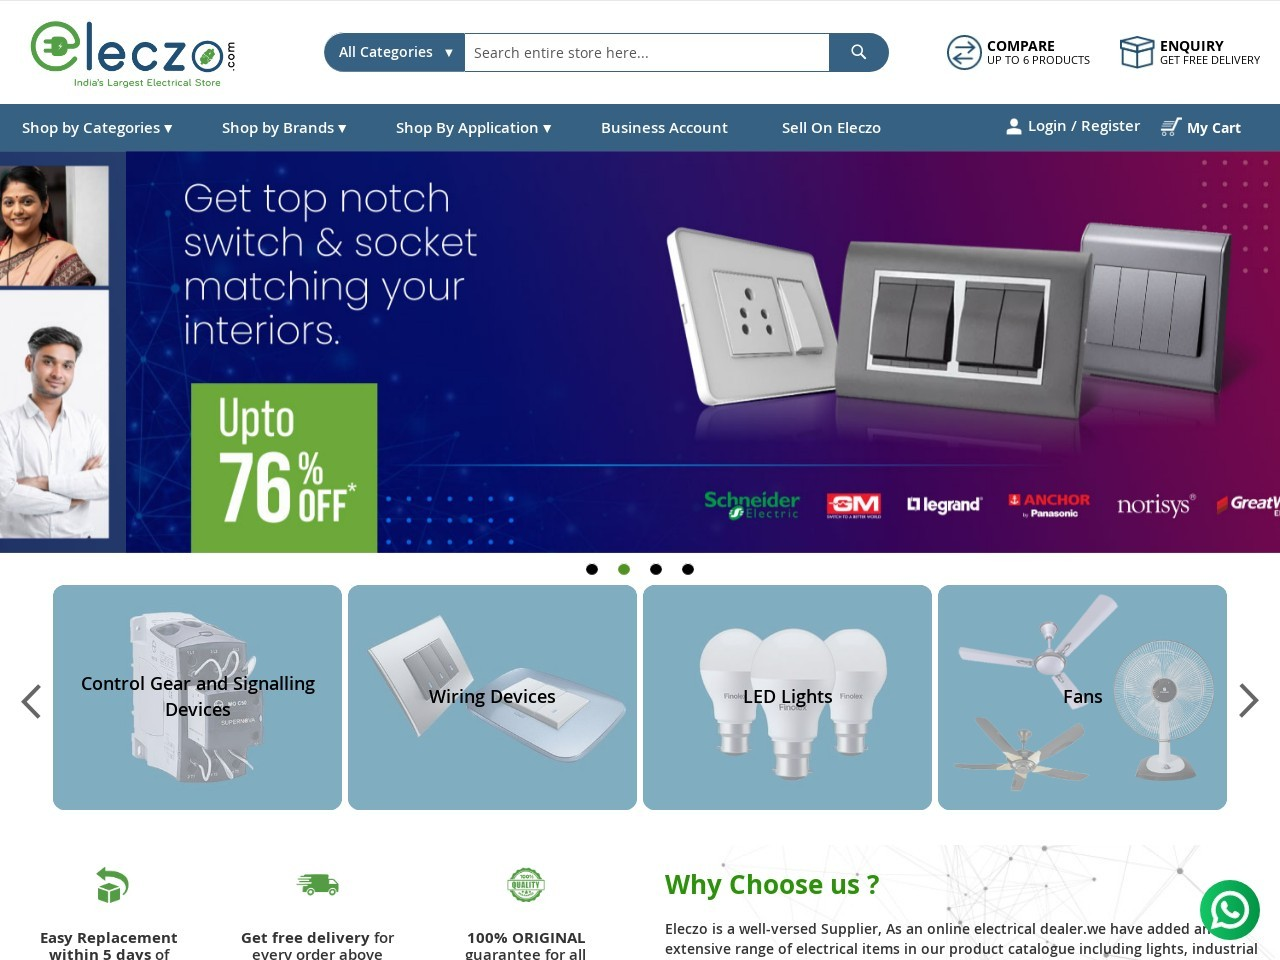 Buy Siemens 5SL44167RC 4 Pole 16 Amp MCB at Online |Eleczo.com